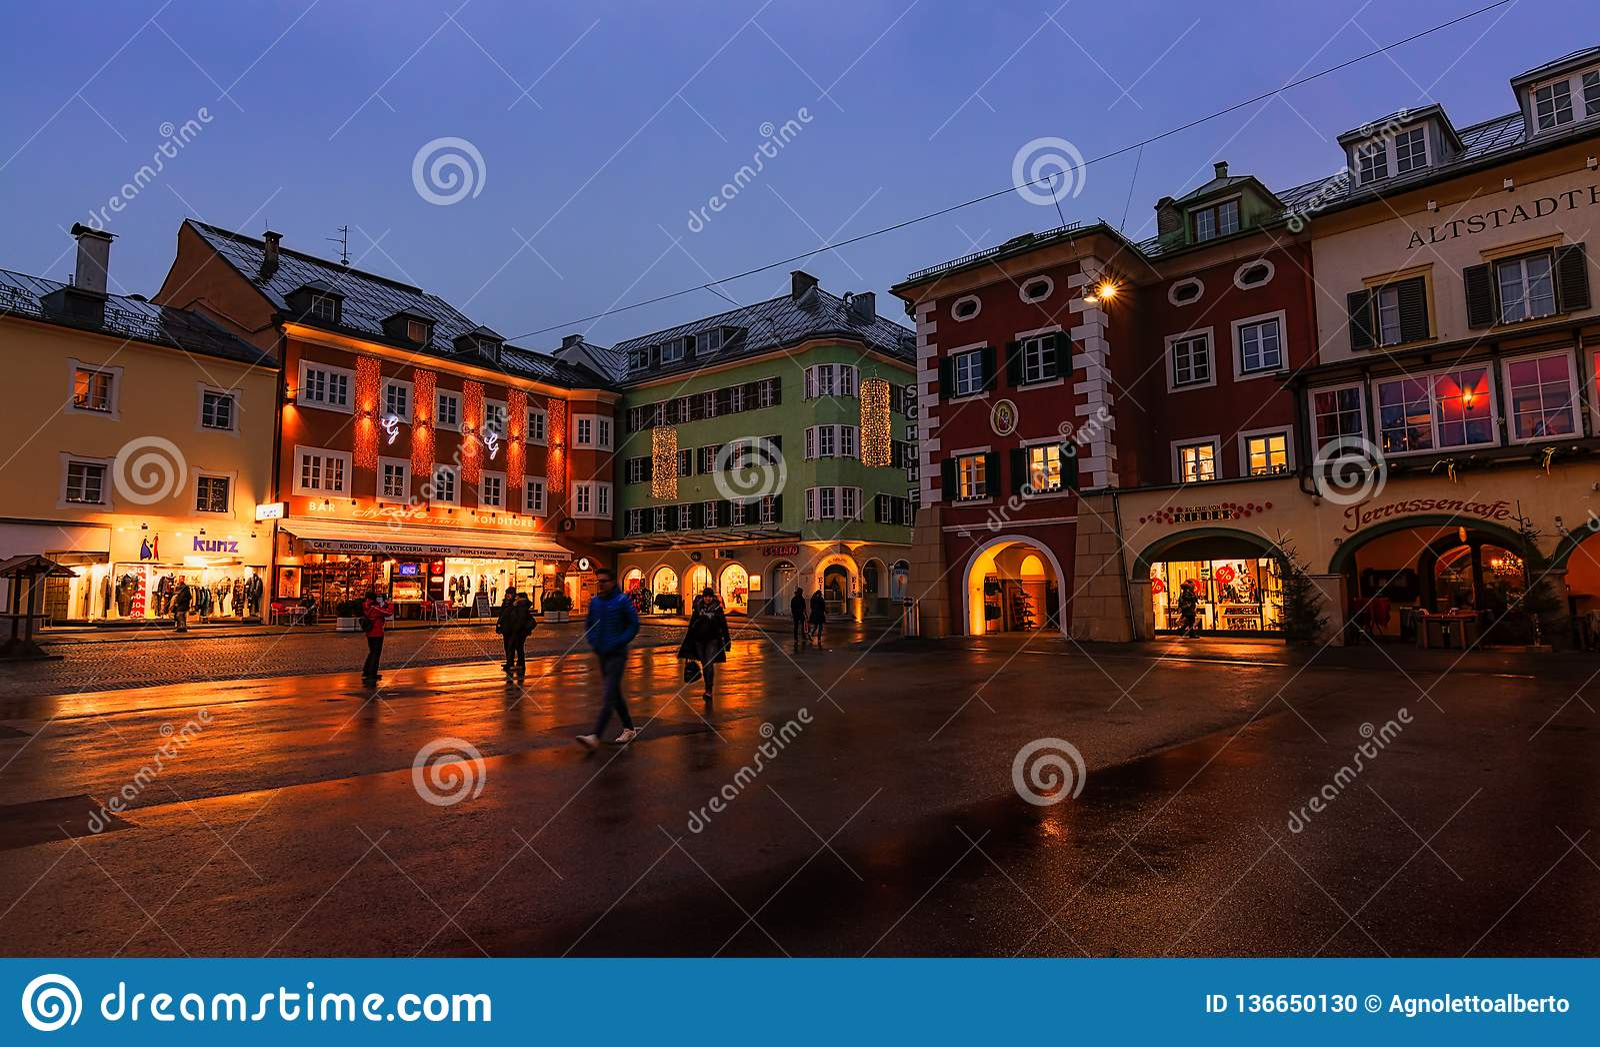 Christmas In Austria 2019.5 January 2019 Lienz Austria Christmas Decorations On The